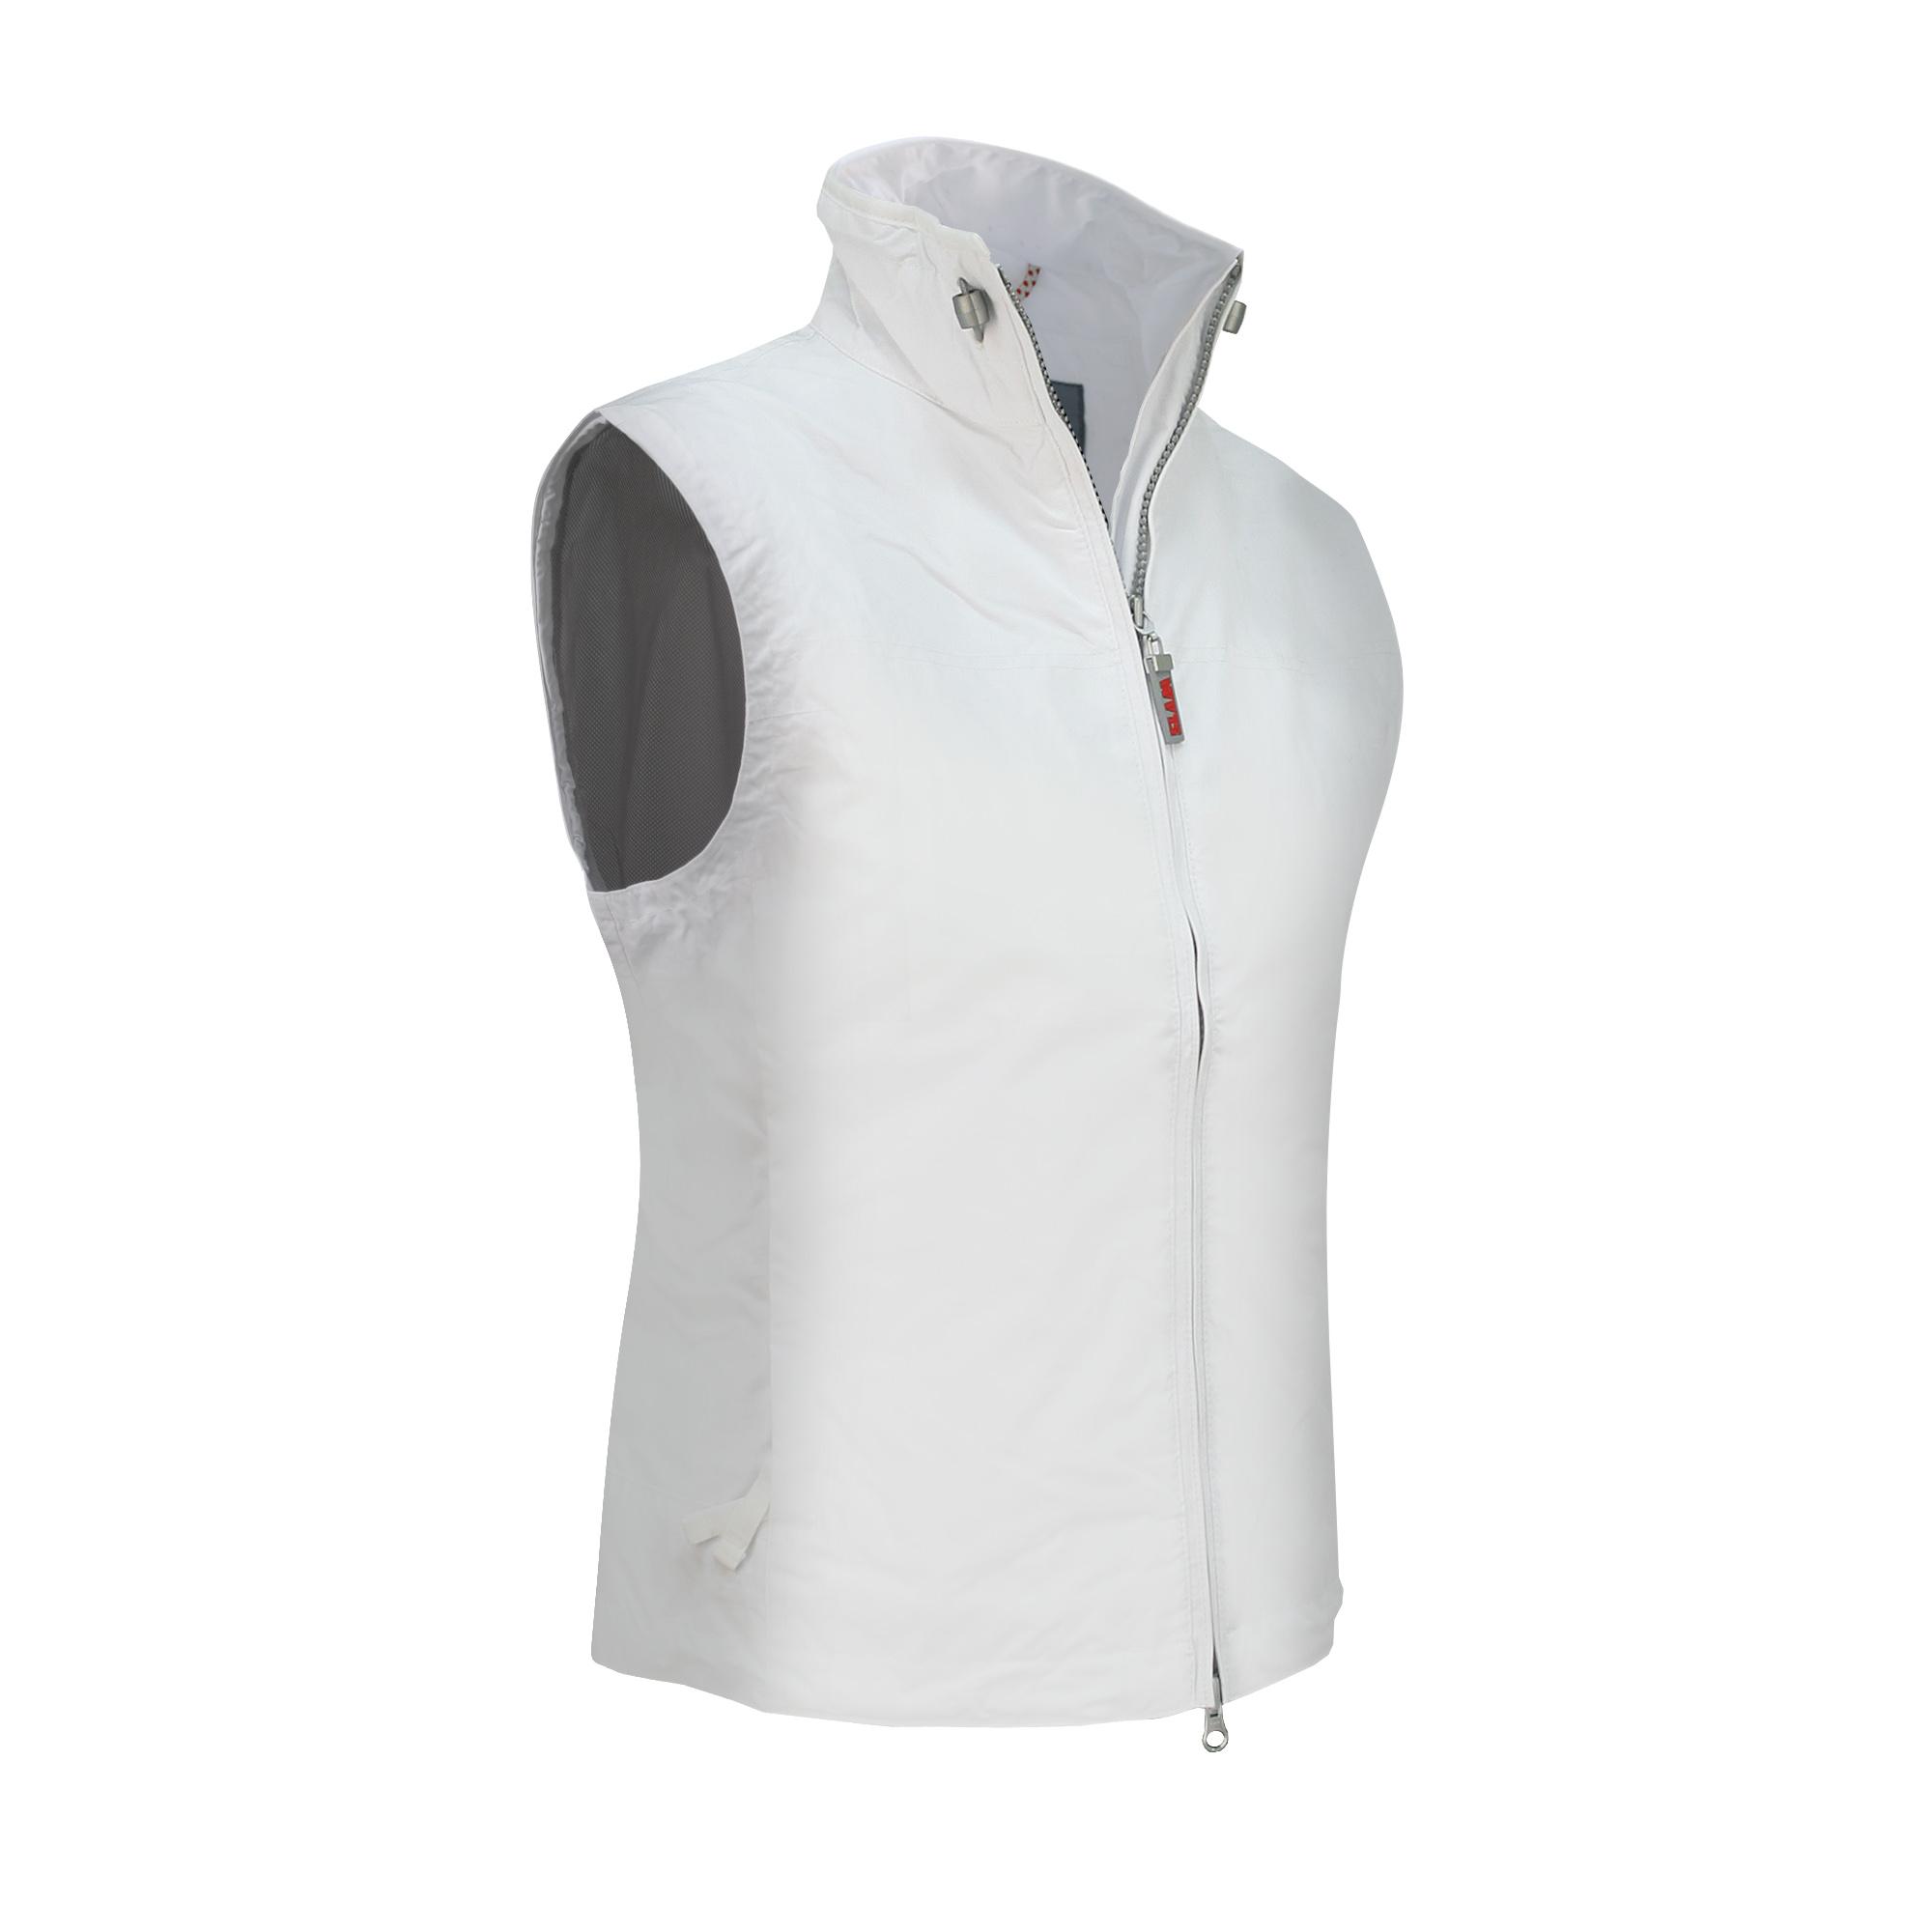 2b746297dff SLAM Women s Summer Sailing Vest - Taylor Made Designs